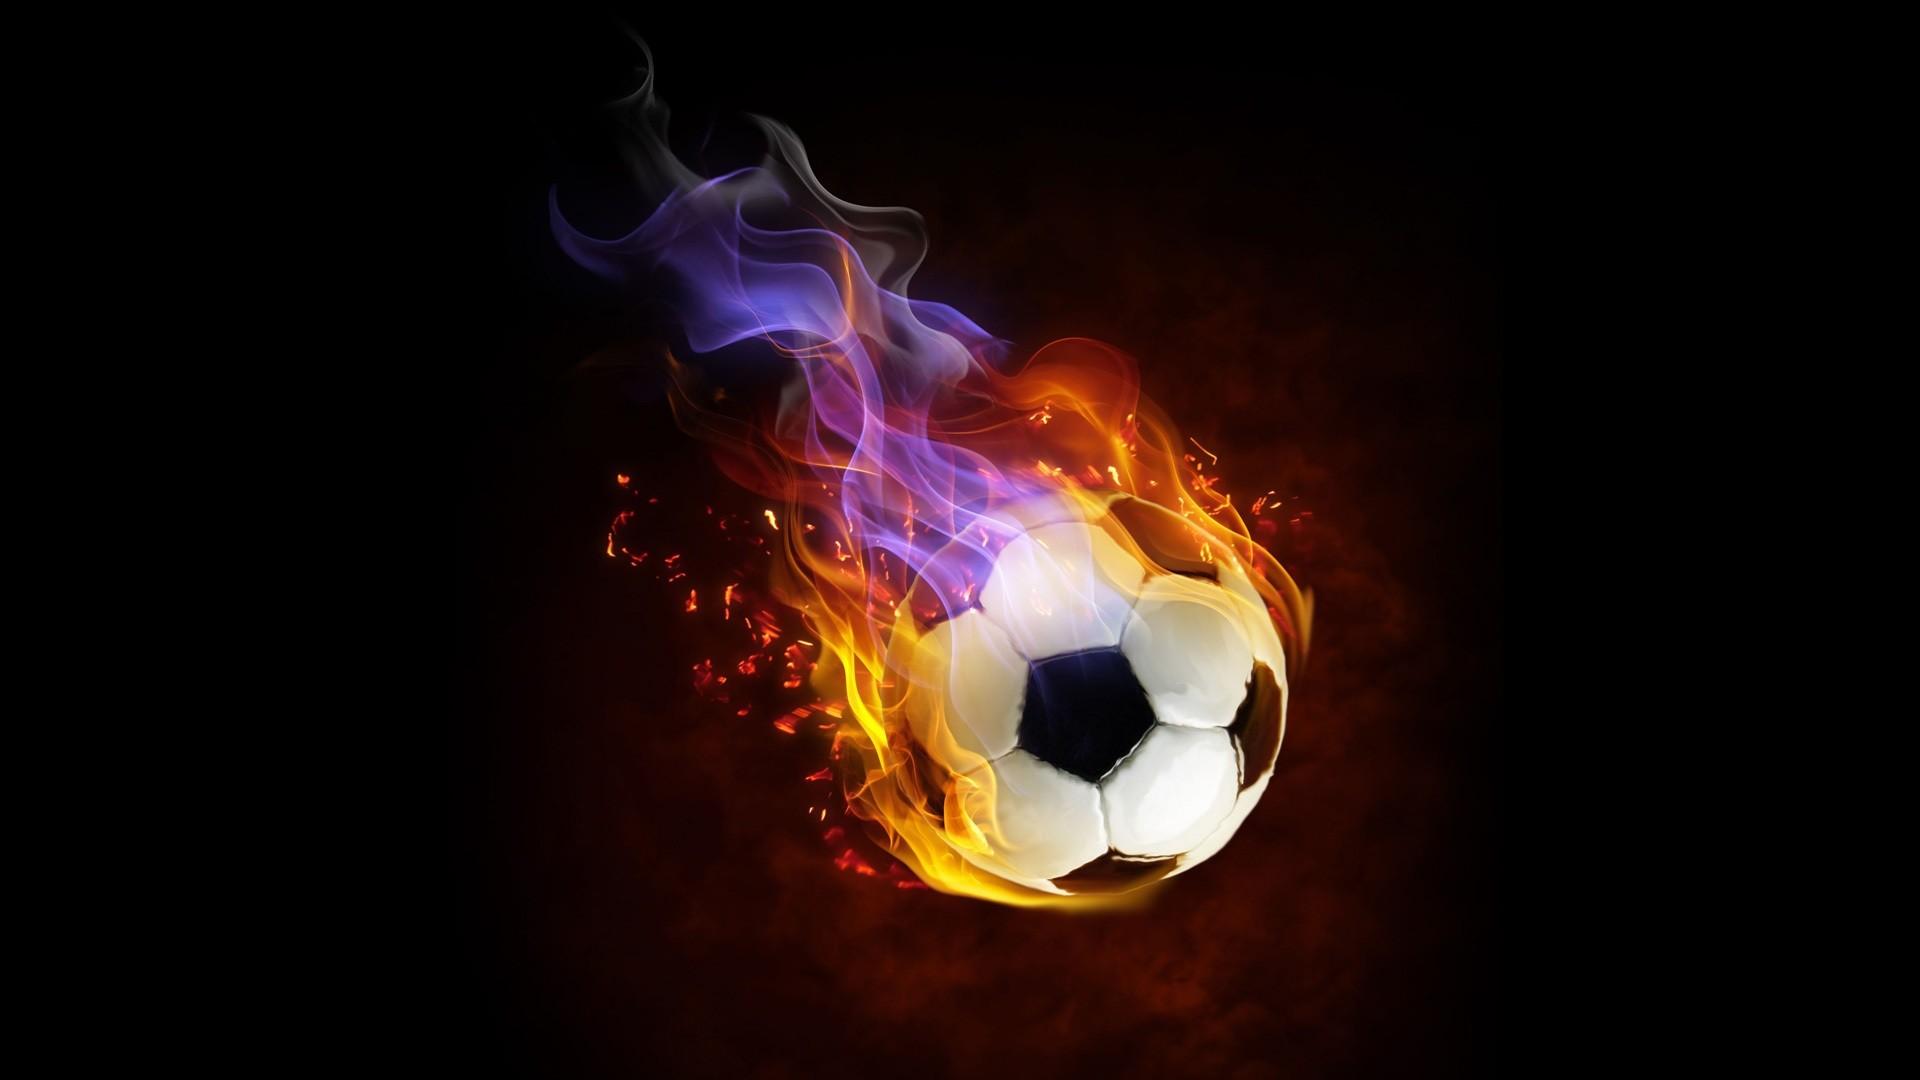 flaming soccer ball wallpaper 55 images